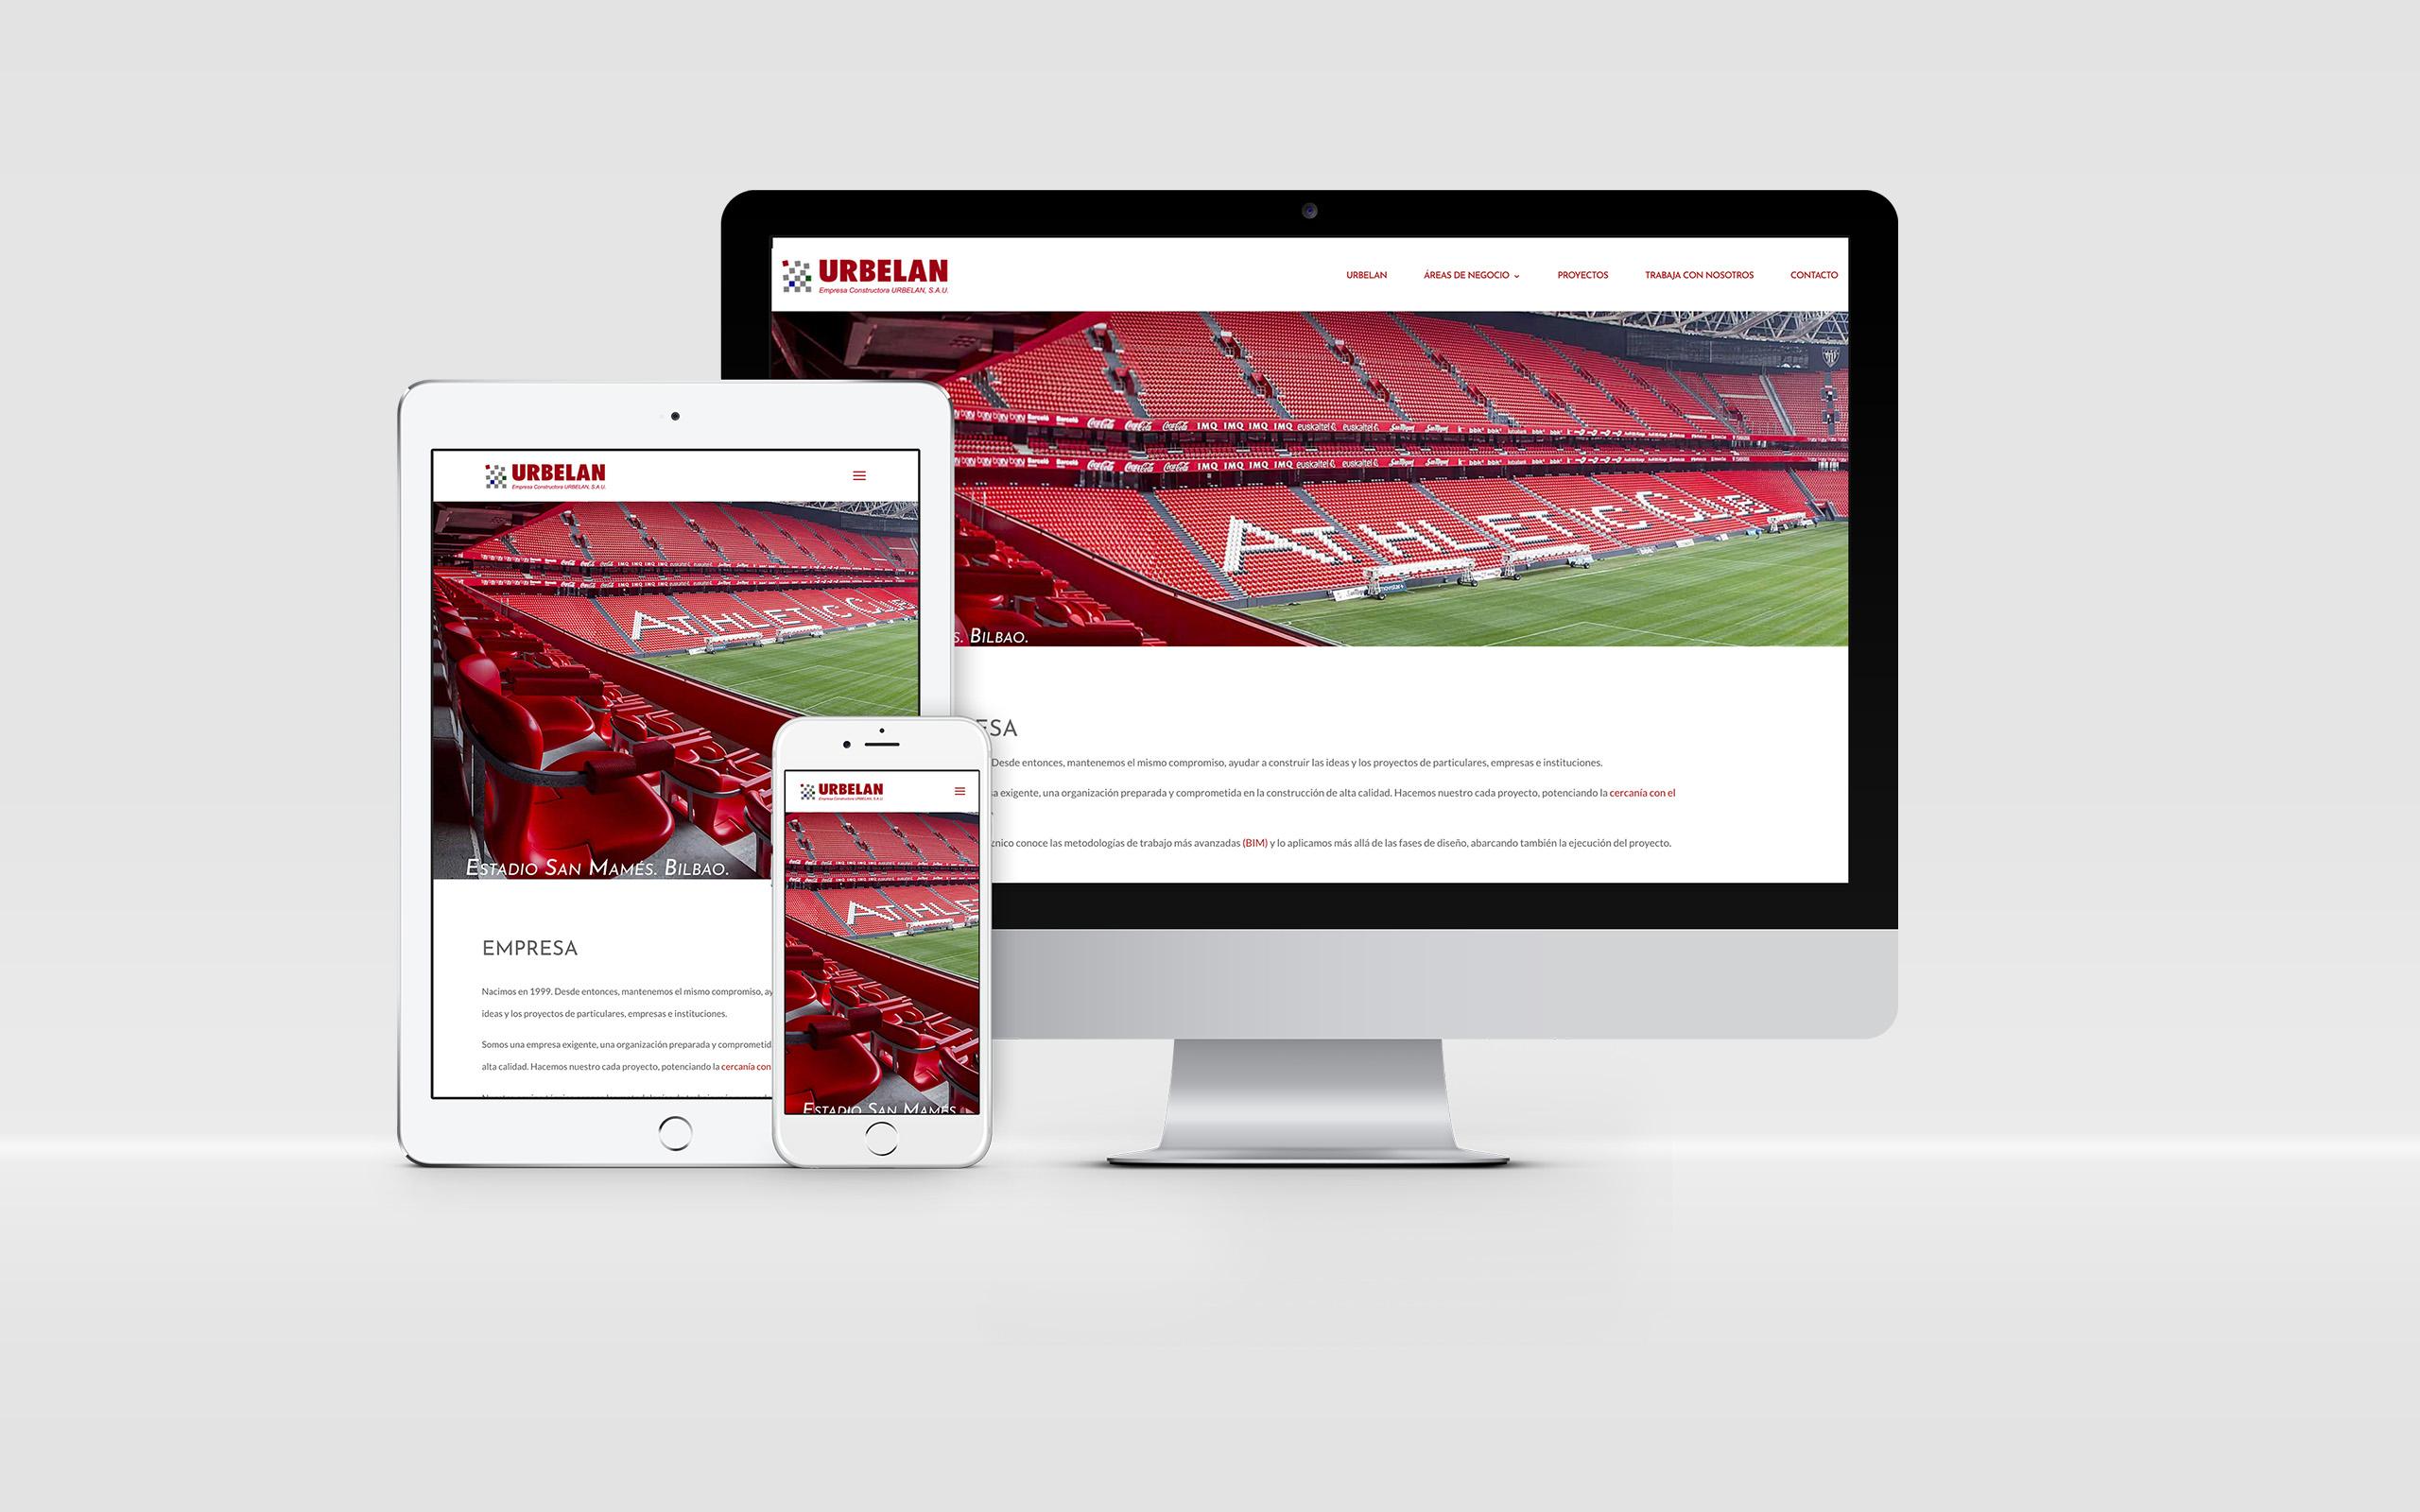 motiva-agencia-comunicacion_online_web_urbelan